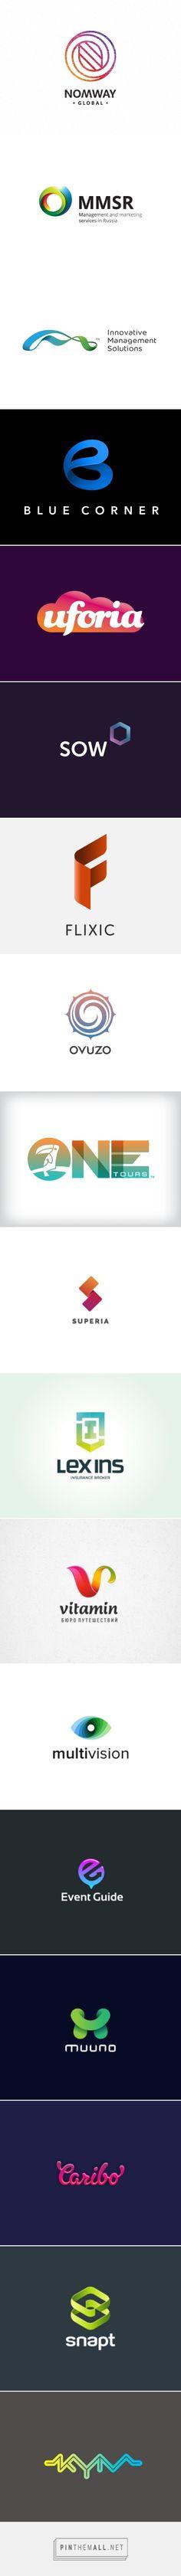 Logo Design: Gradients | Abduzeedo Design Inspiration - created via http://pinthemall.net